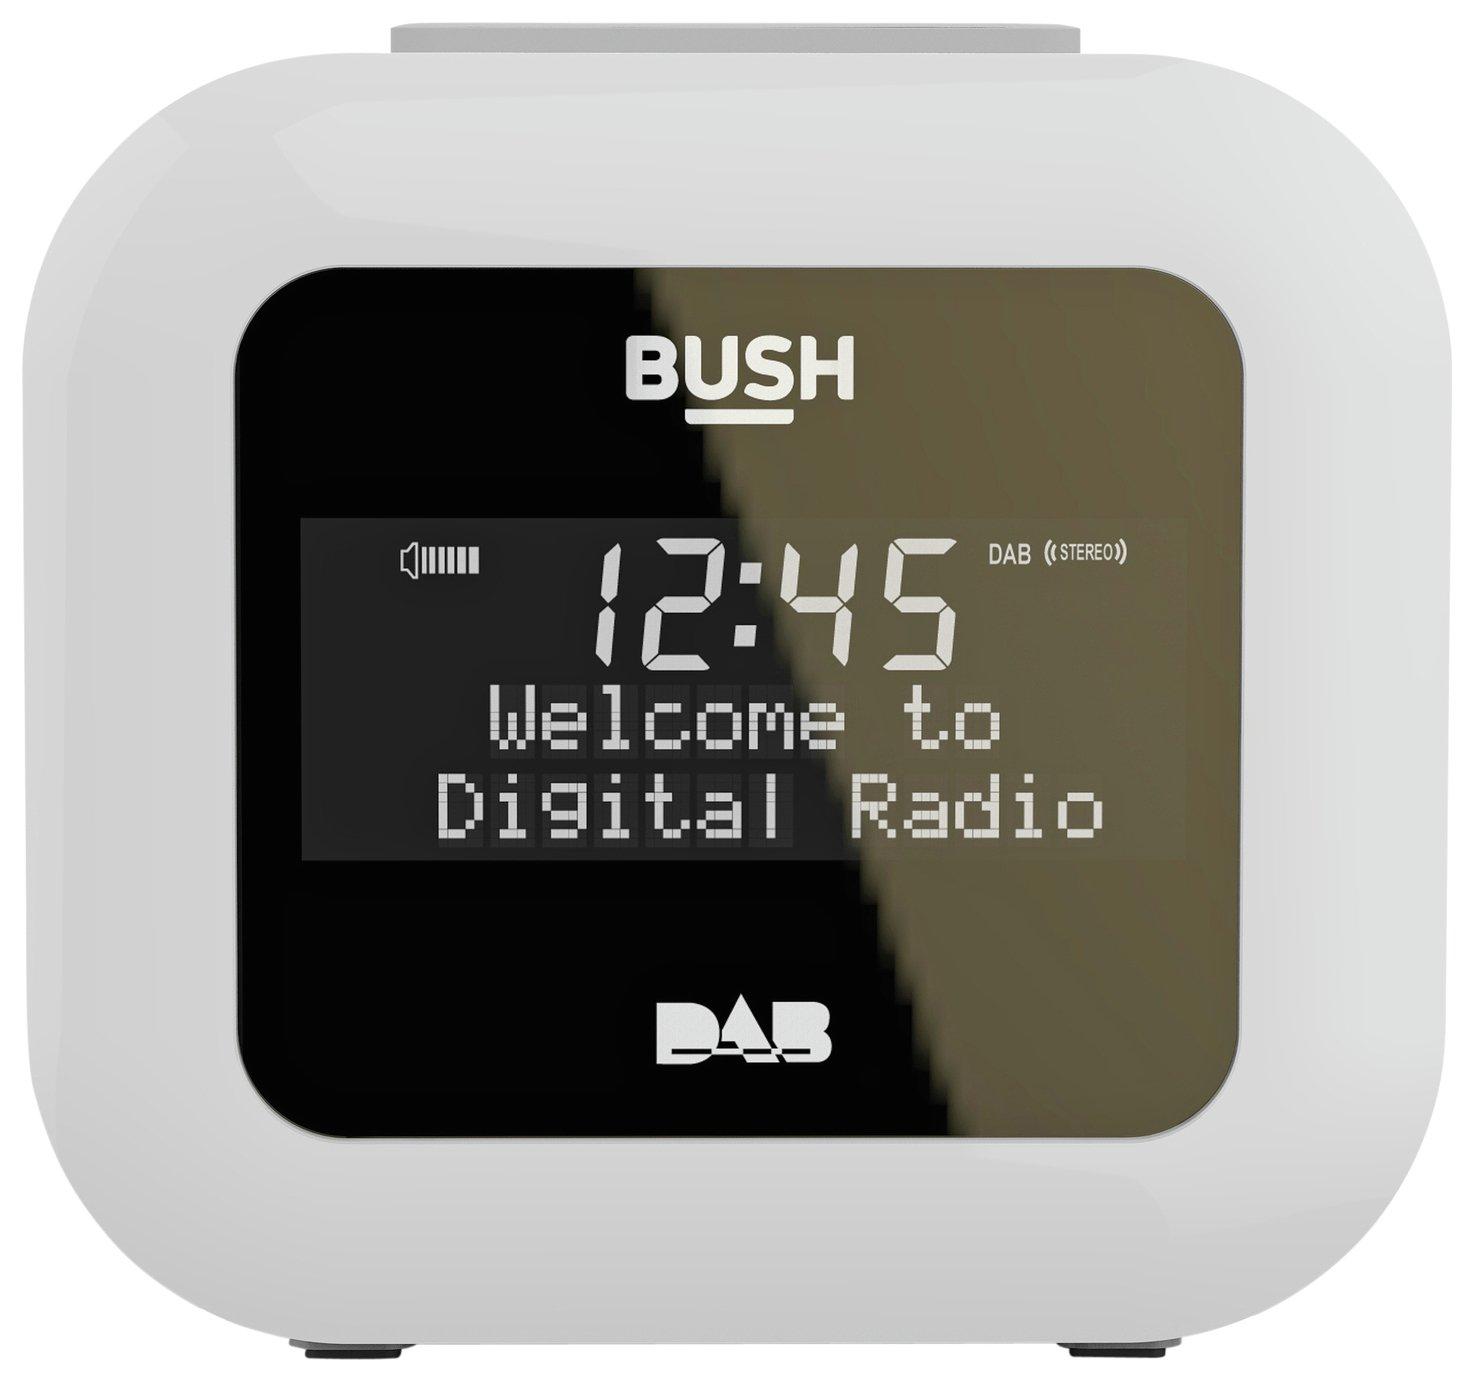 Bush USB DAB Clock Radio - White